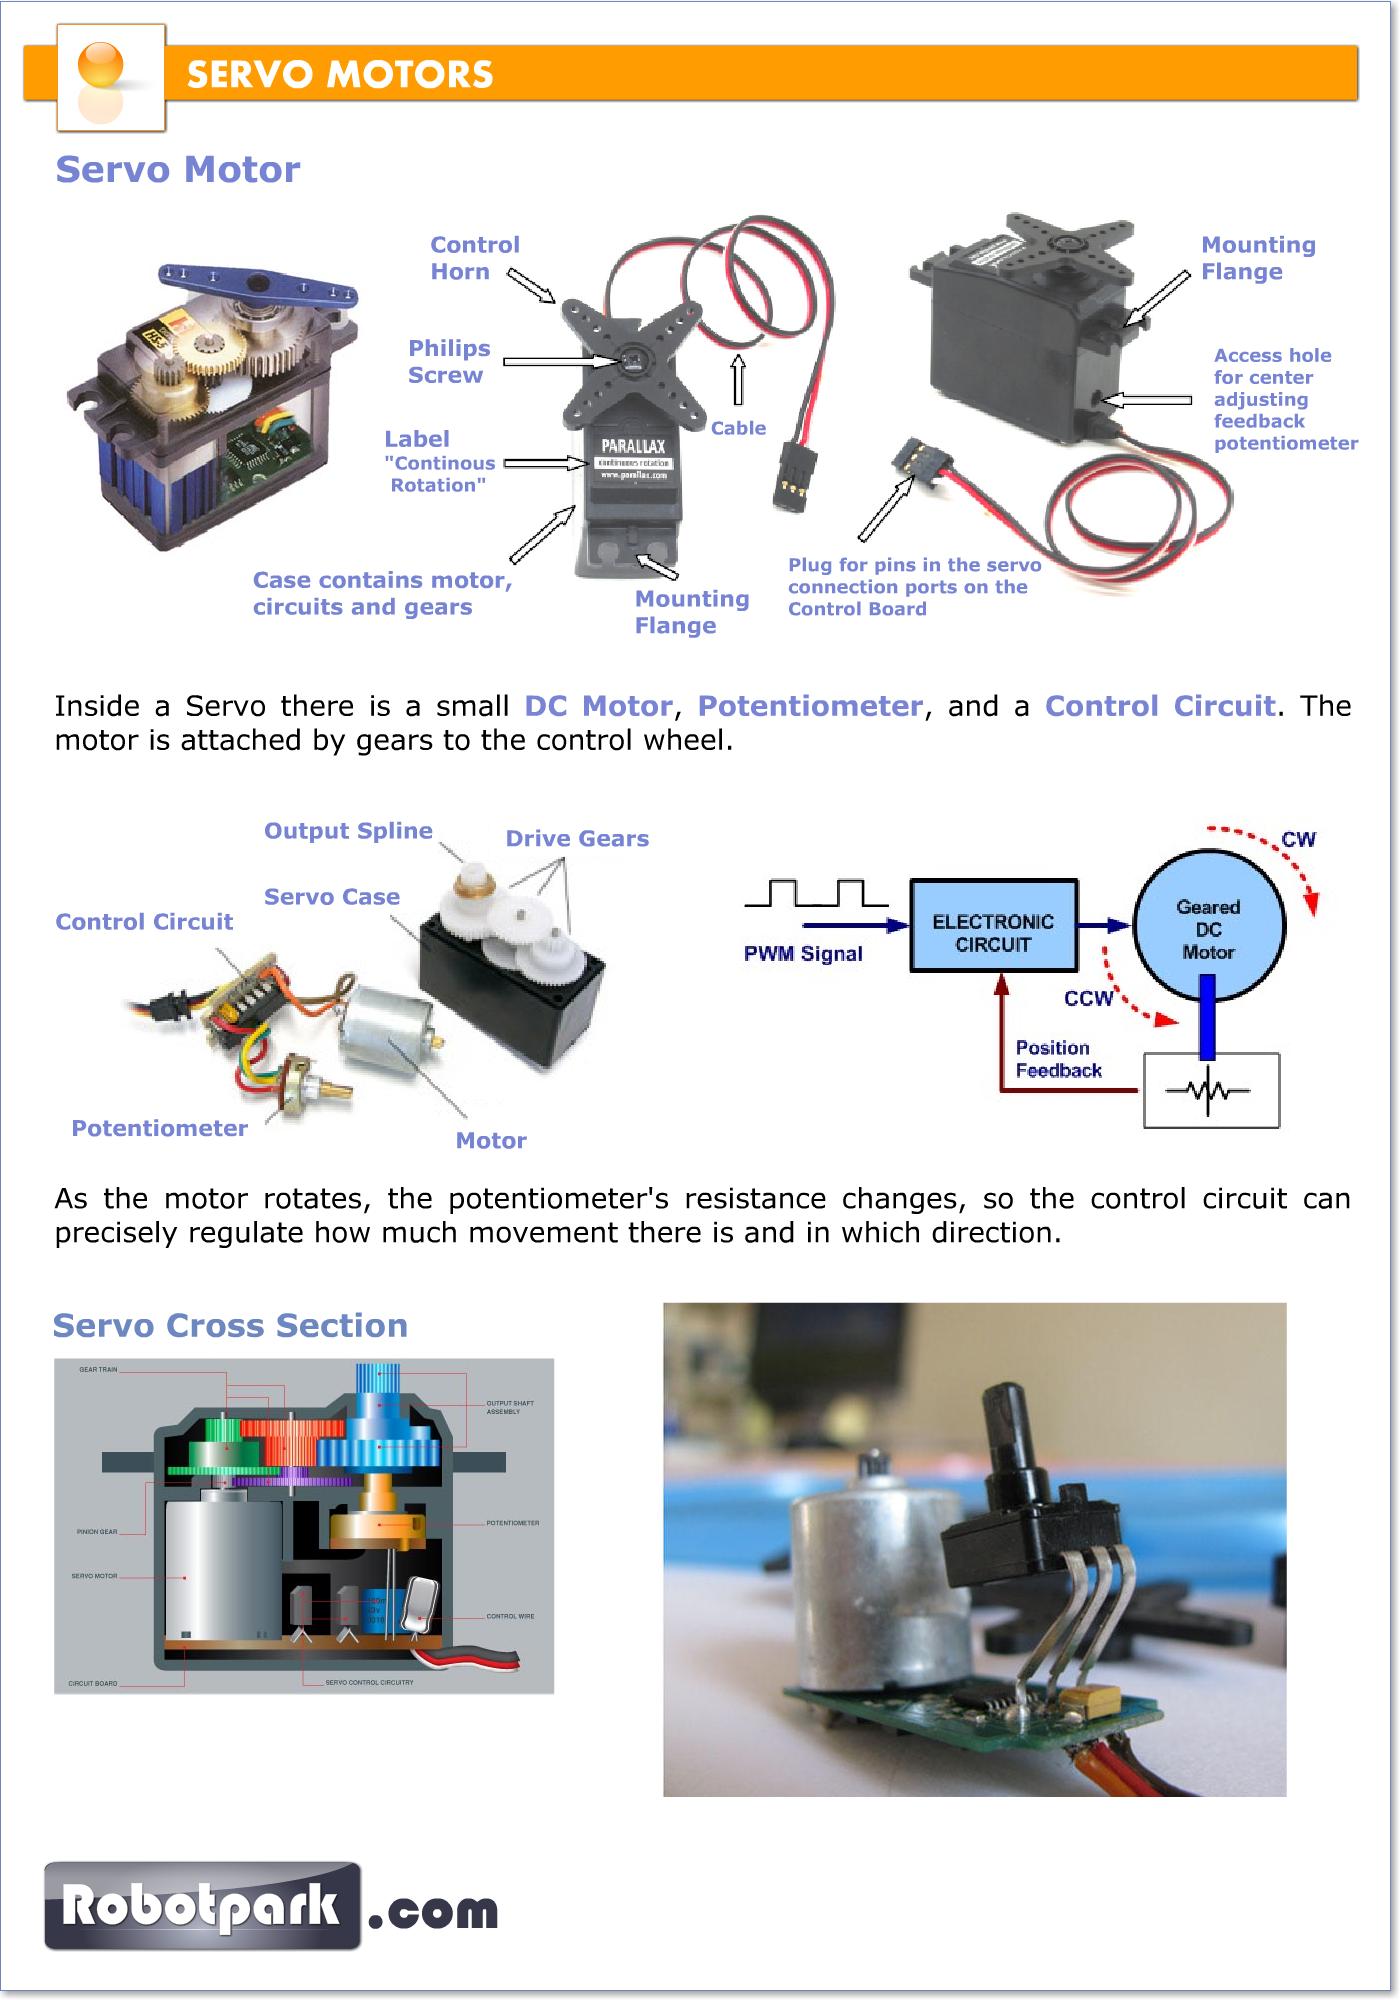 Servo motors 51057 robotpark academy for Stepper motor vs servo